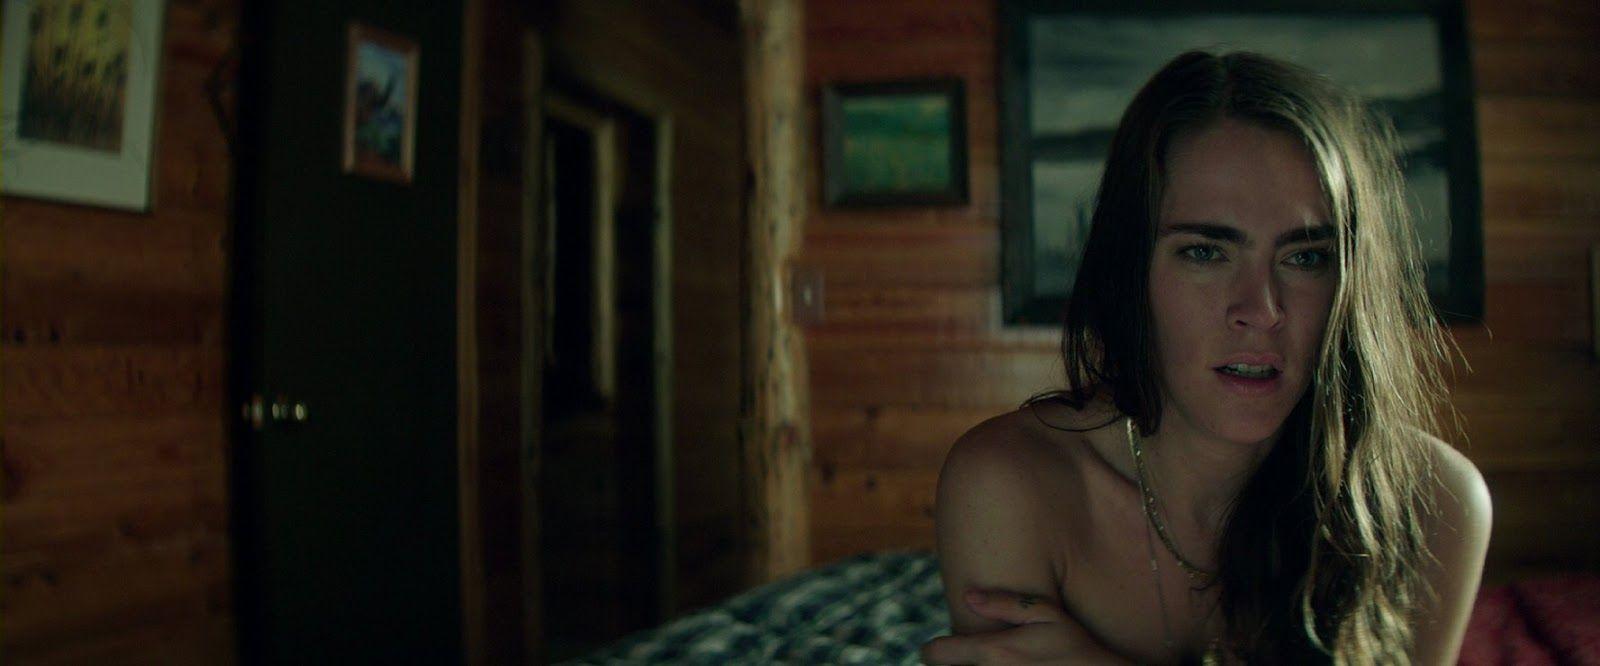 Youtube Nadine Crocker nudes (83 photo), Topless, Cleavage, Boobs, legs 2018